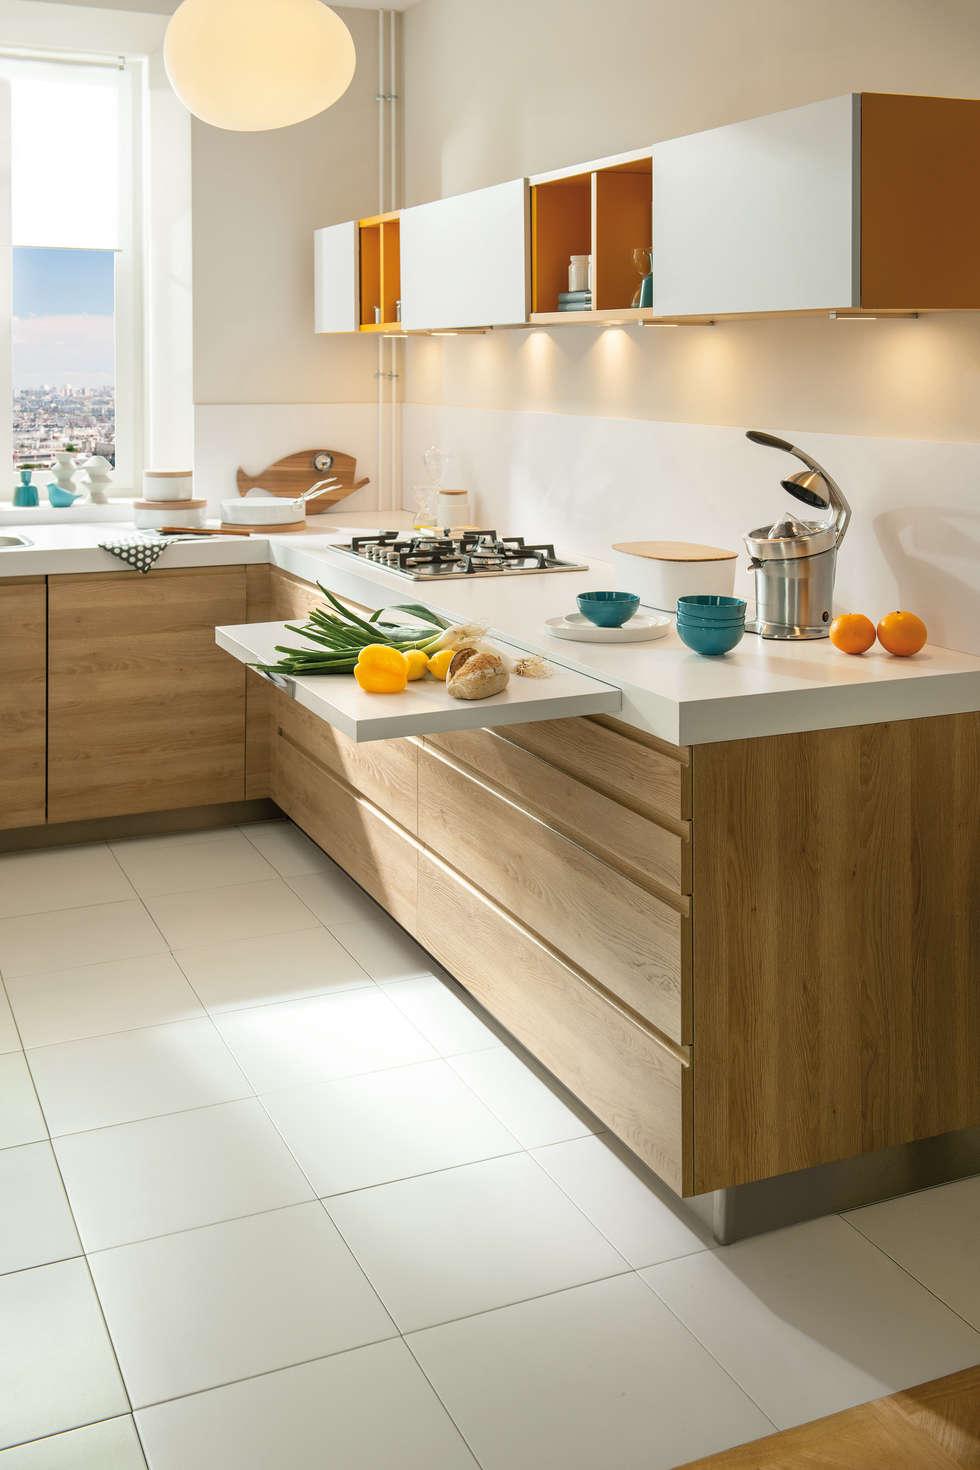 Interior design ideas architecture and renovating photos - Schmidt kitchens ...